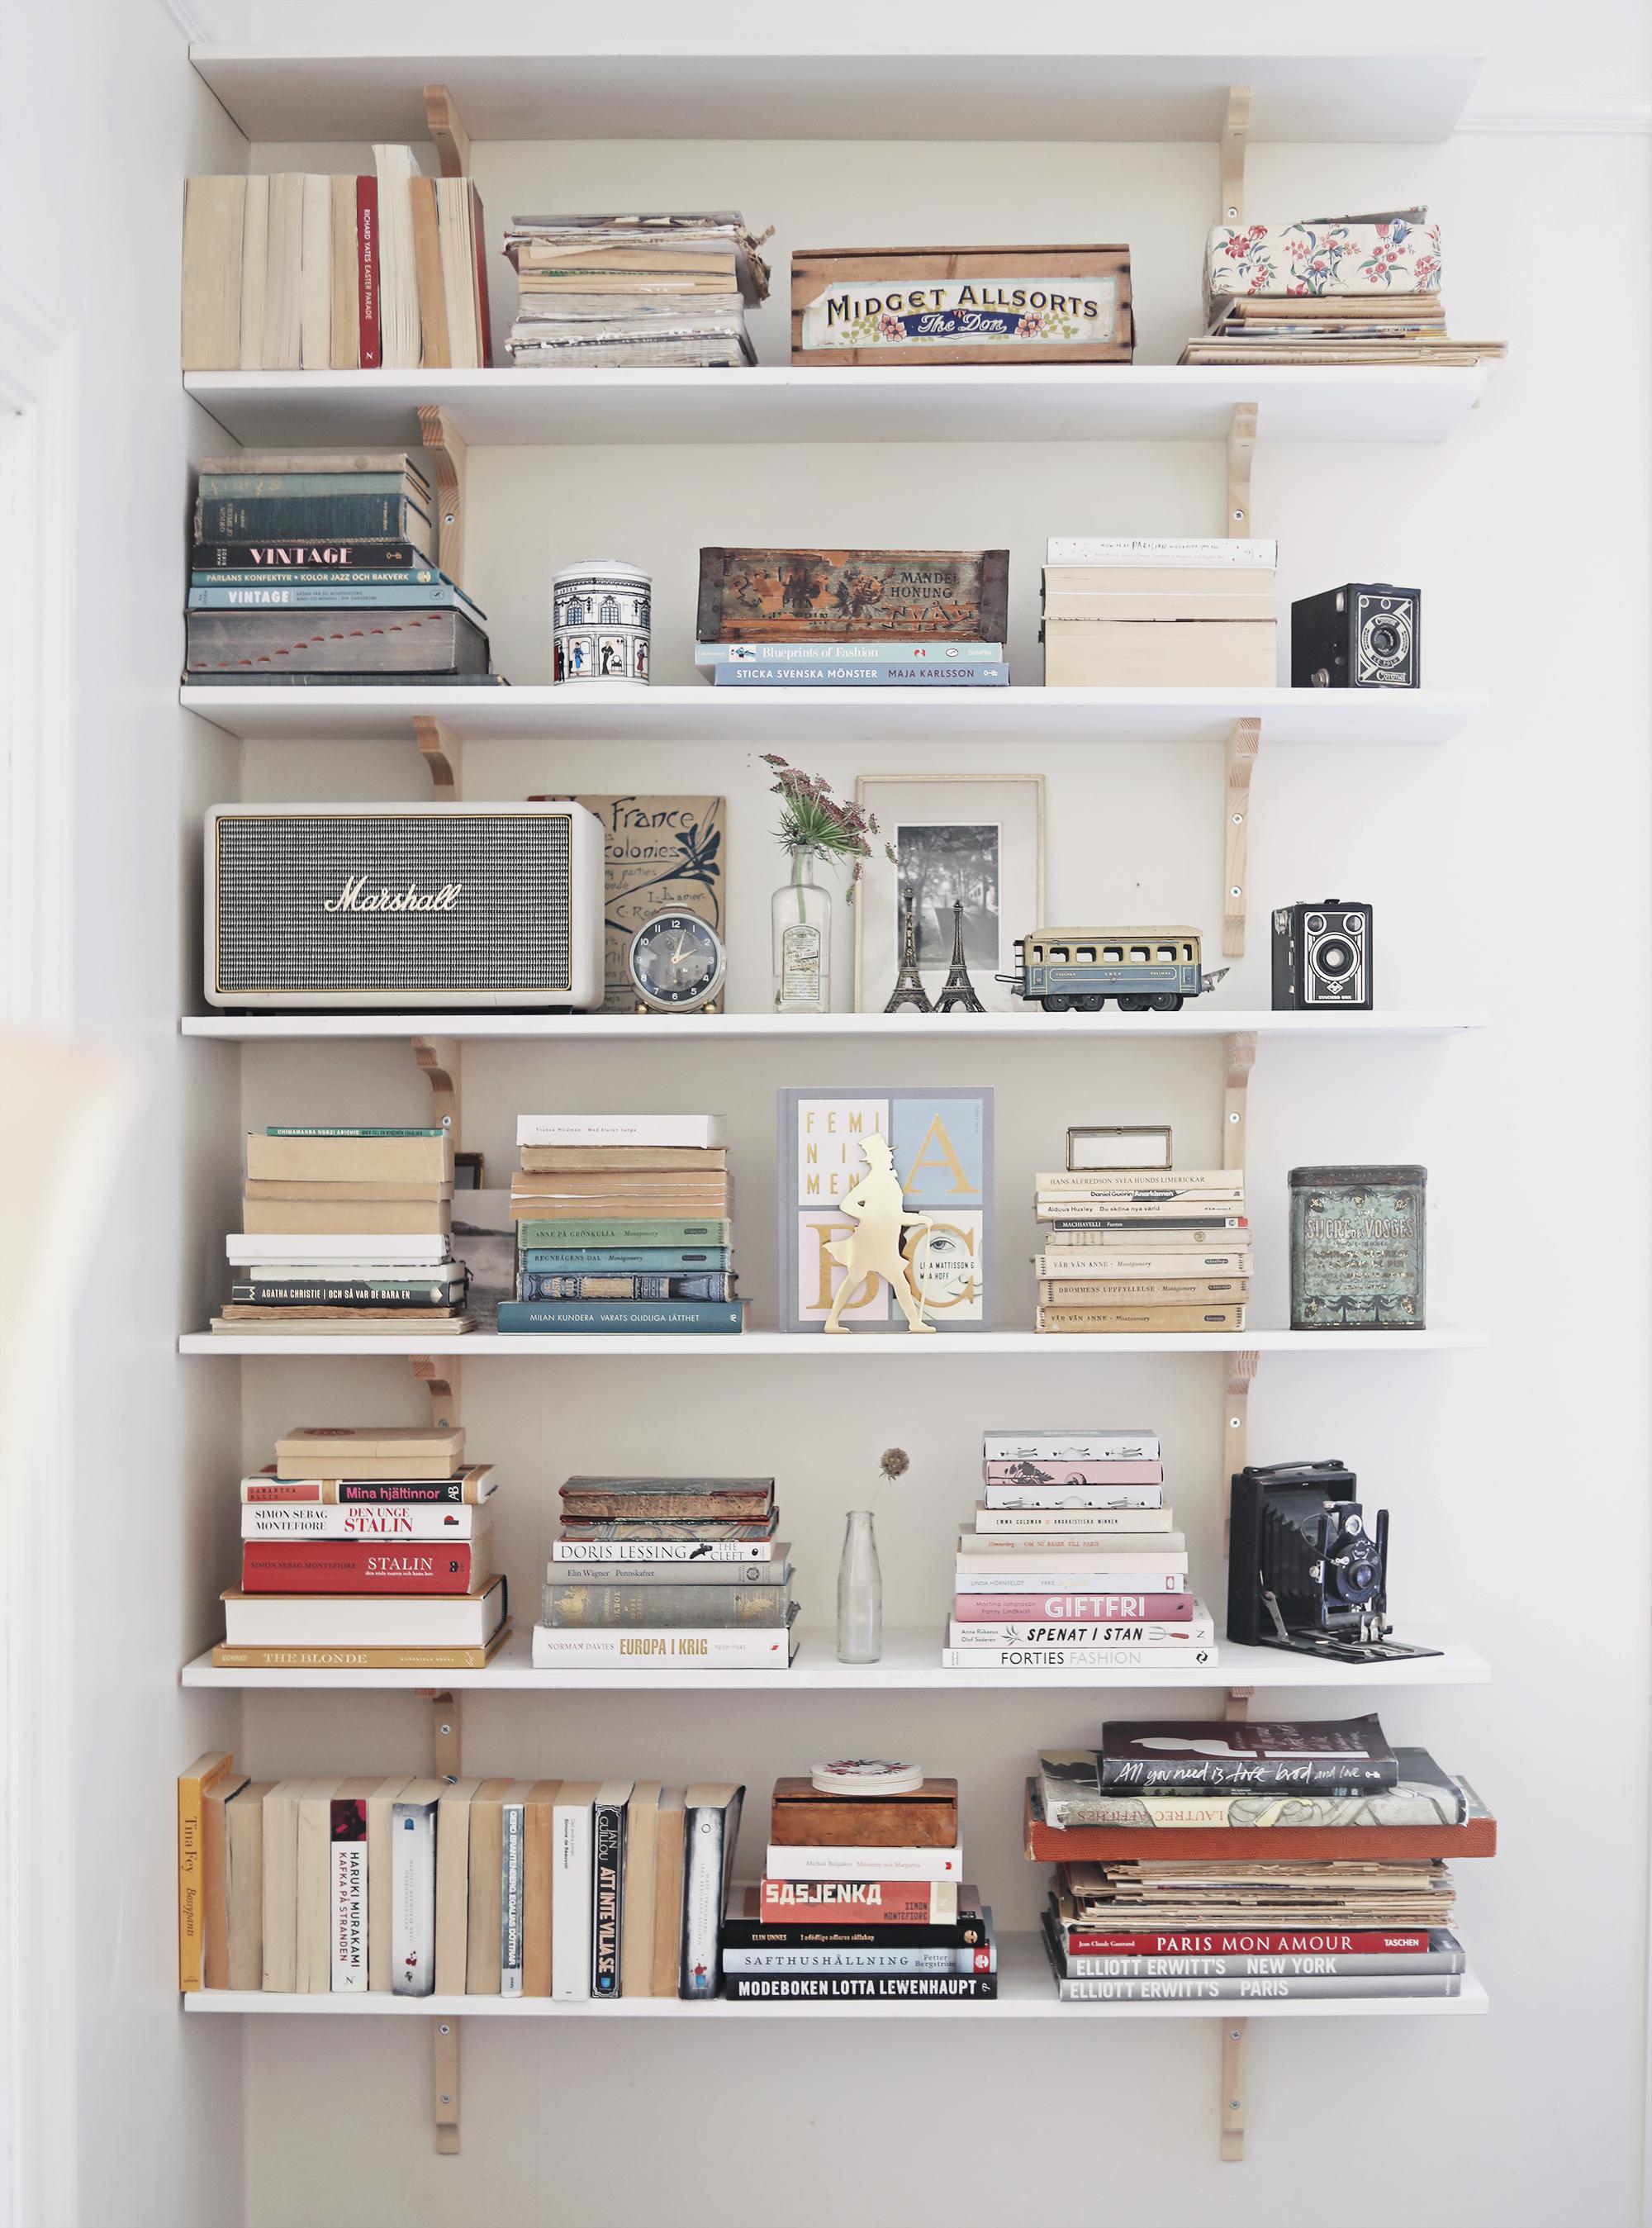 bokhylla bookshelf inredning interior books vintage Paris emmasvintage farbror blå Elsa beskow konsoler trä